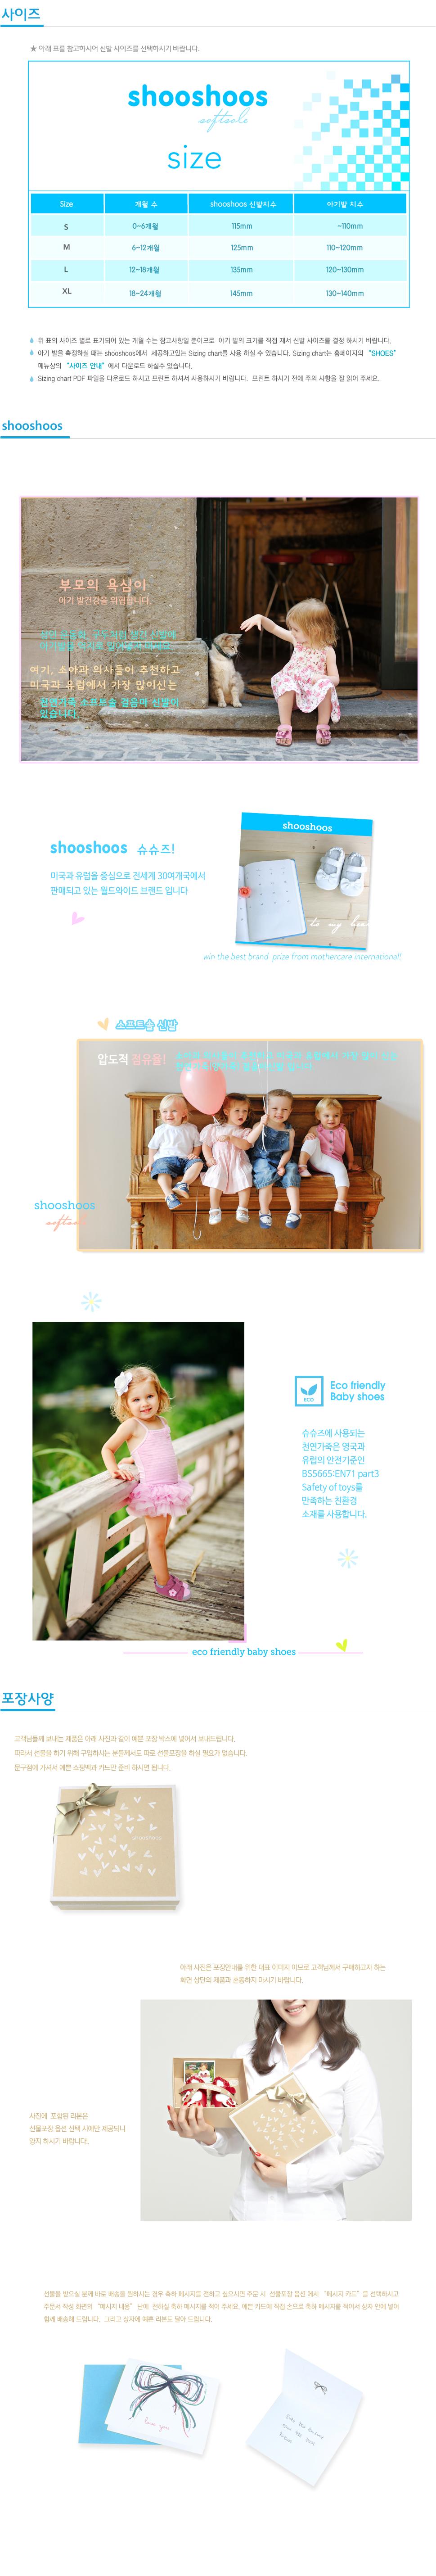 Detail-View-디자인변경6-1(20141121)_웹및장치용출력_08.jpg